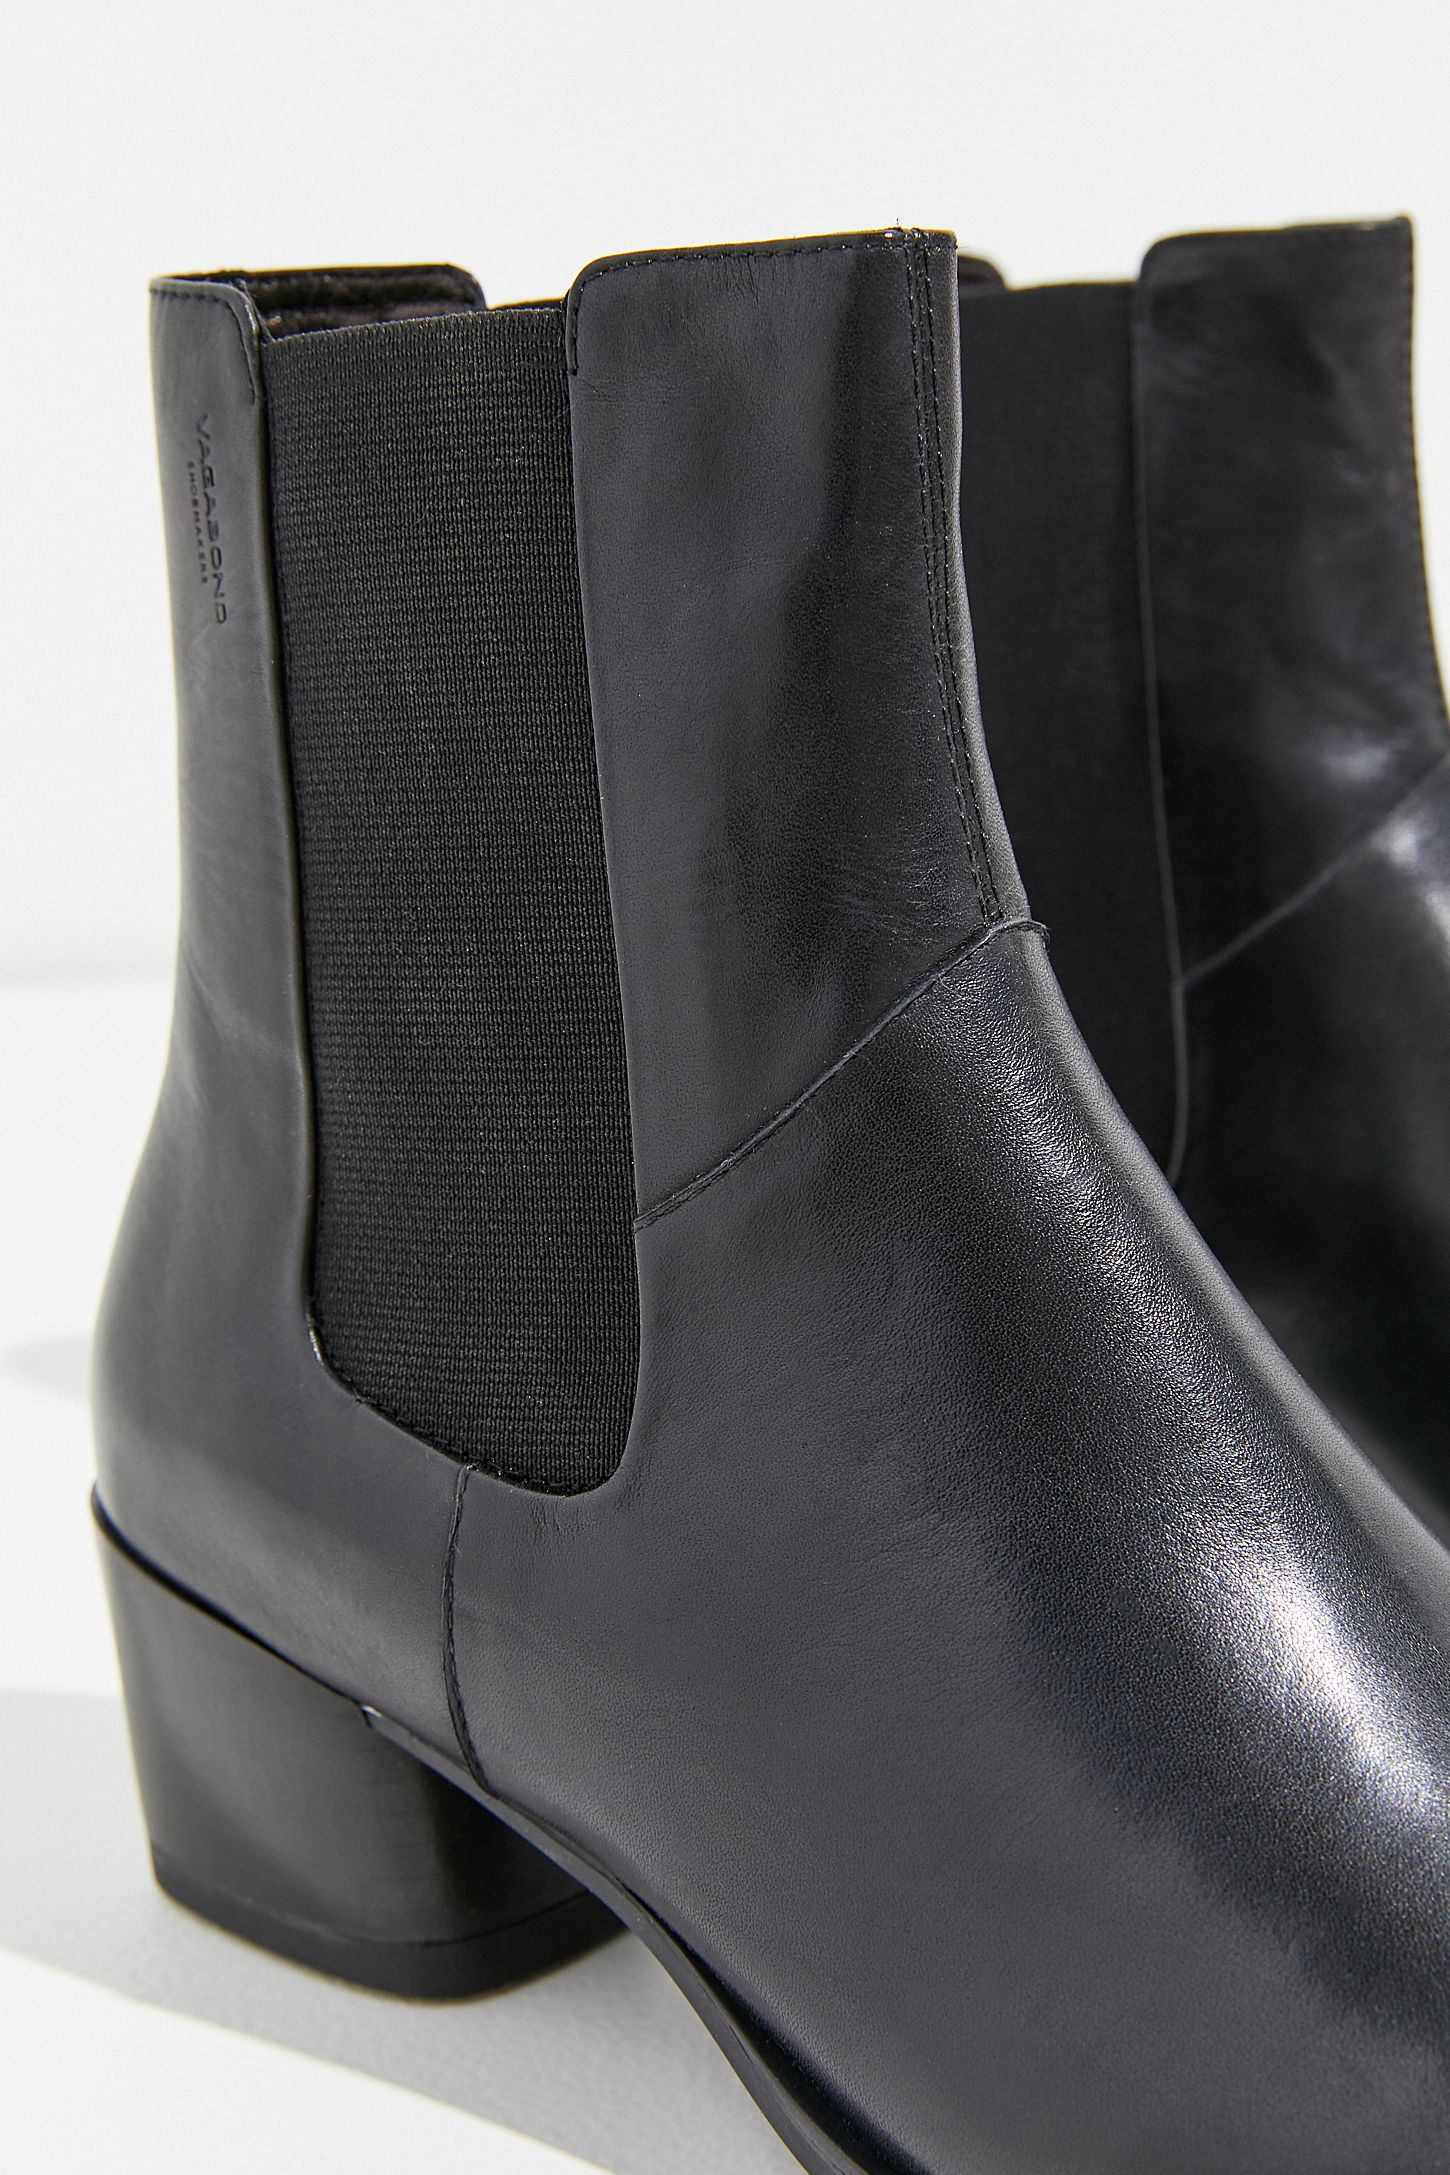 54ecdfb25dc75f Slide View  6  Vagabond Shoemakers Lara Chelsea Boot